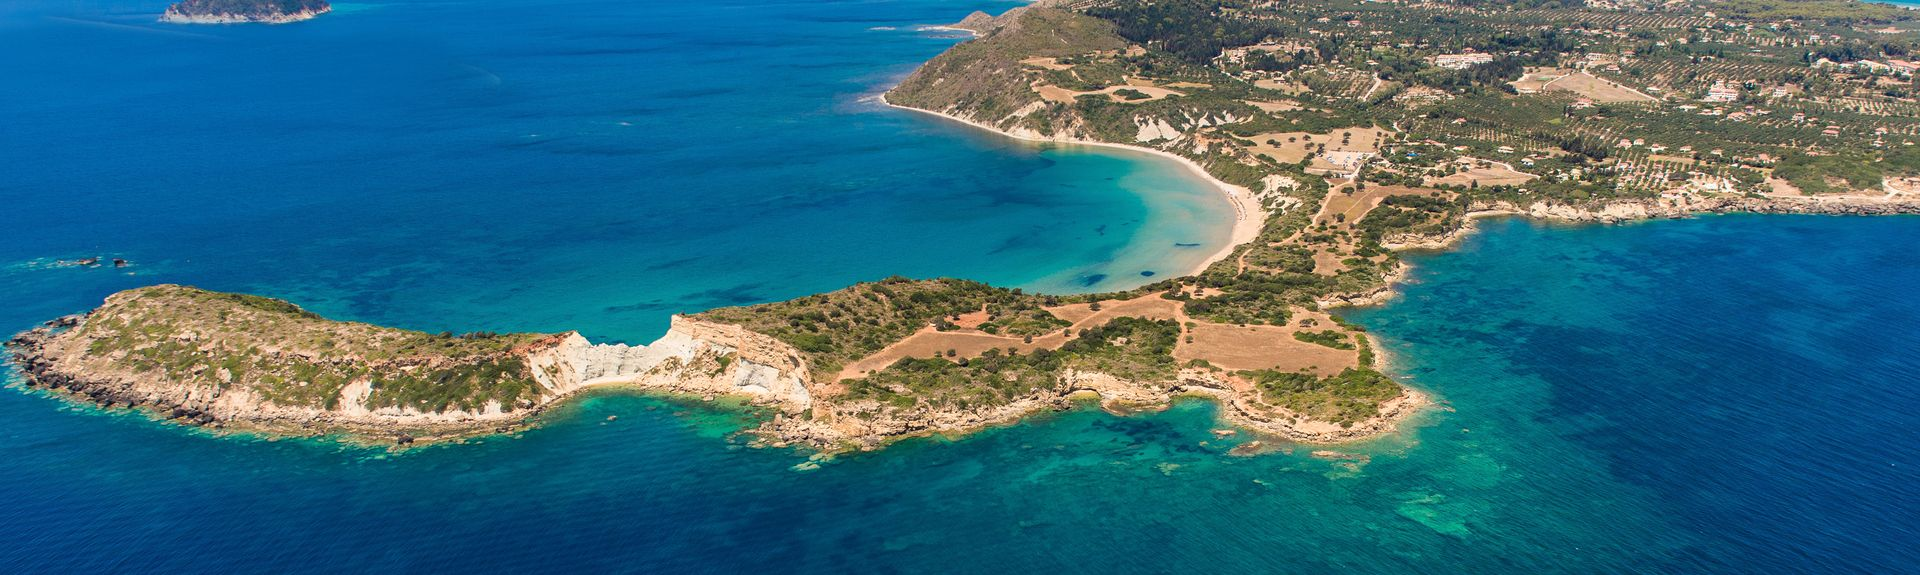 Argassi Beach, Zakynthos, Greece